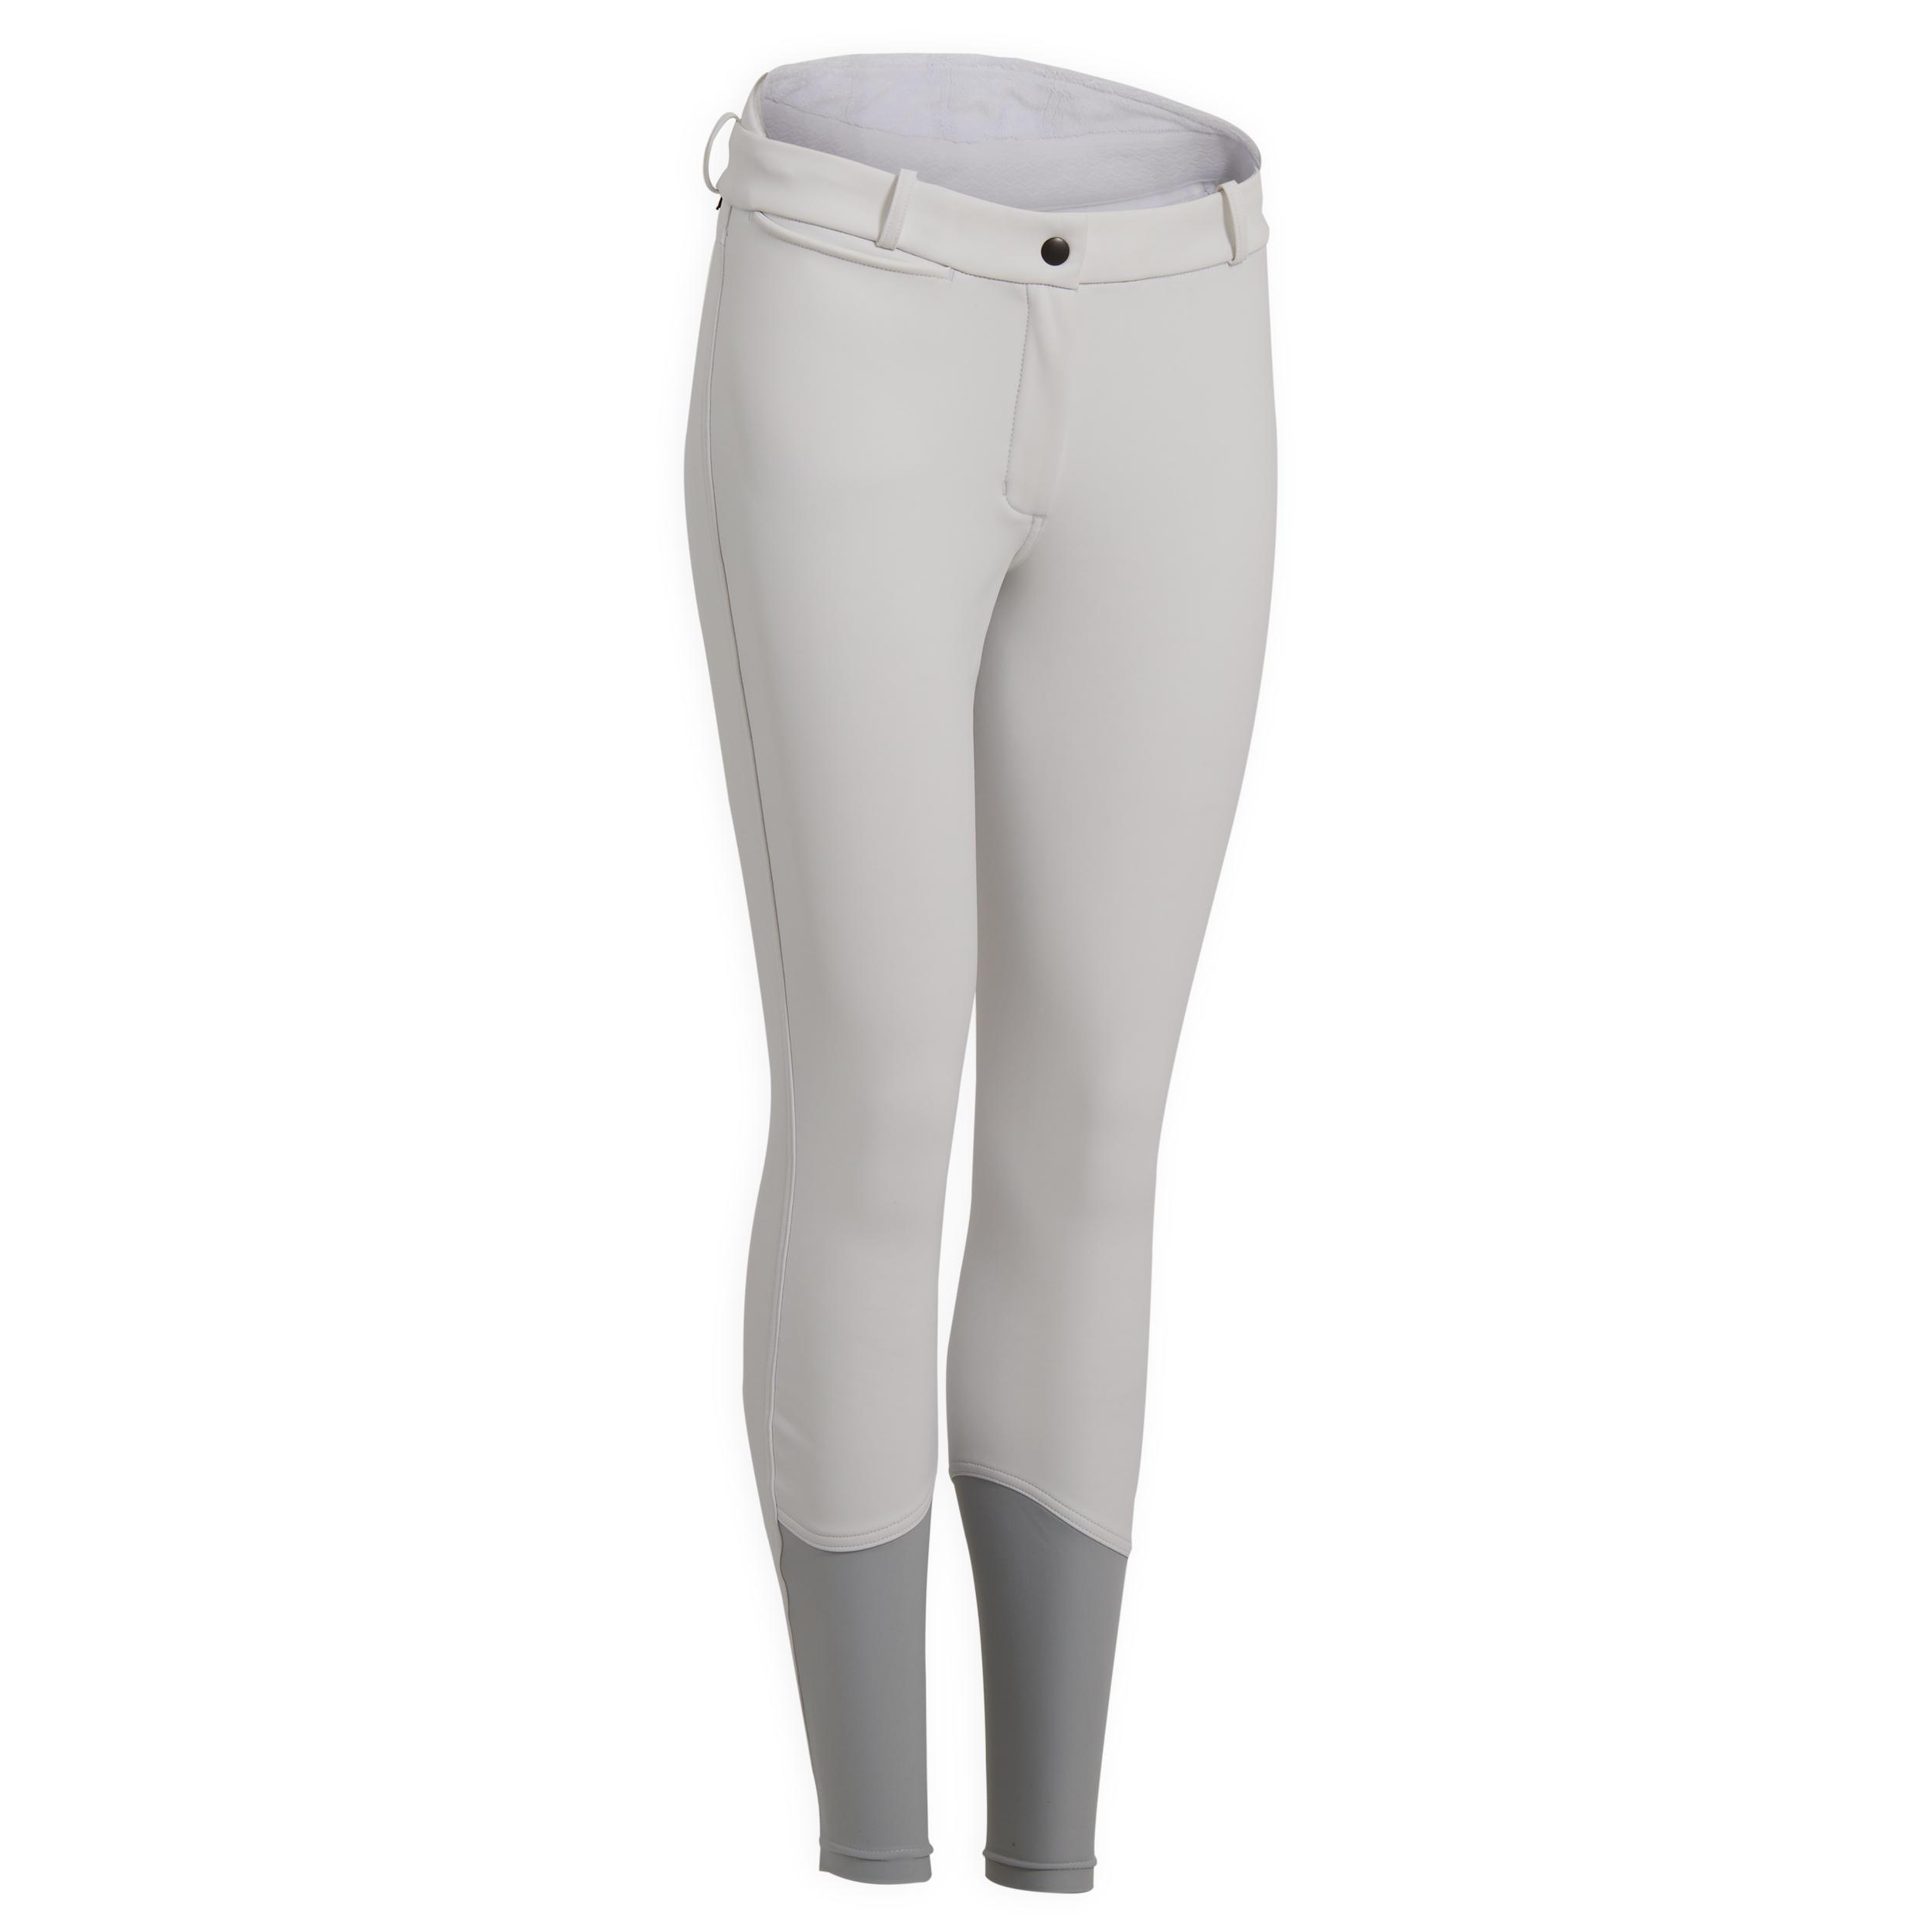 Pantalon Kipwarm Impermeabil imagine produs